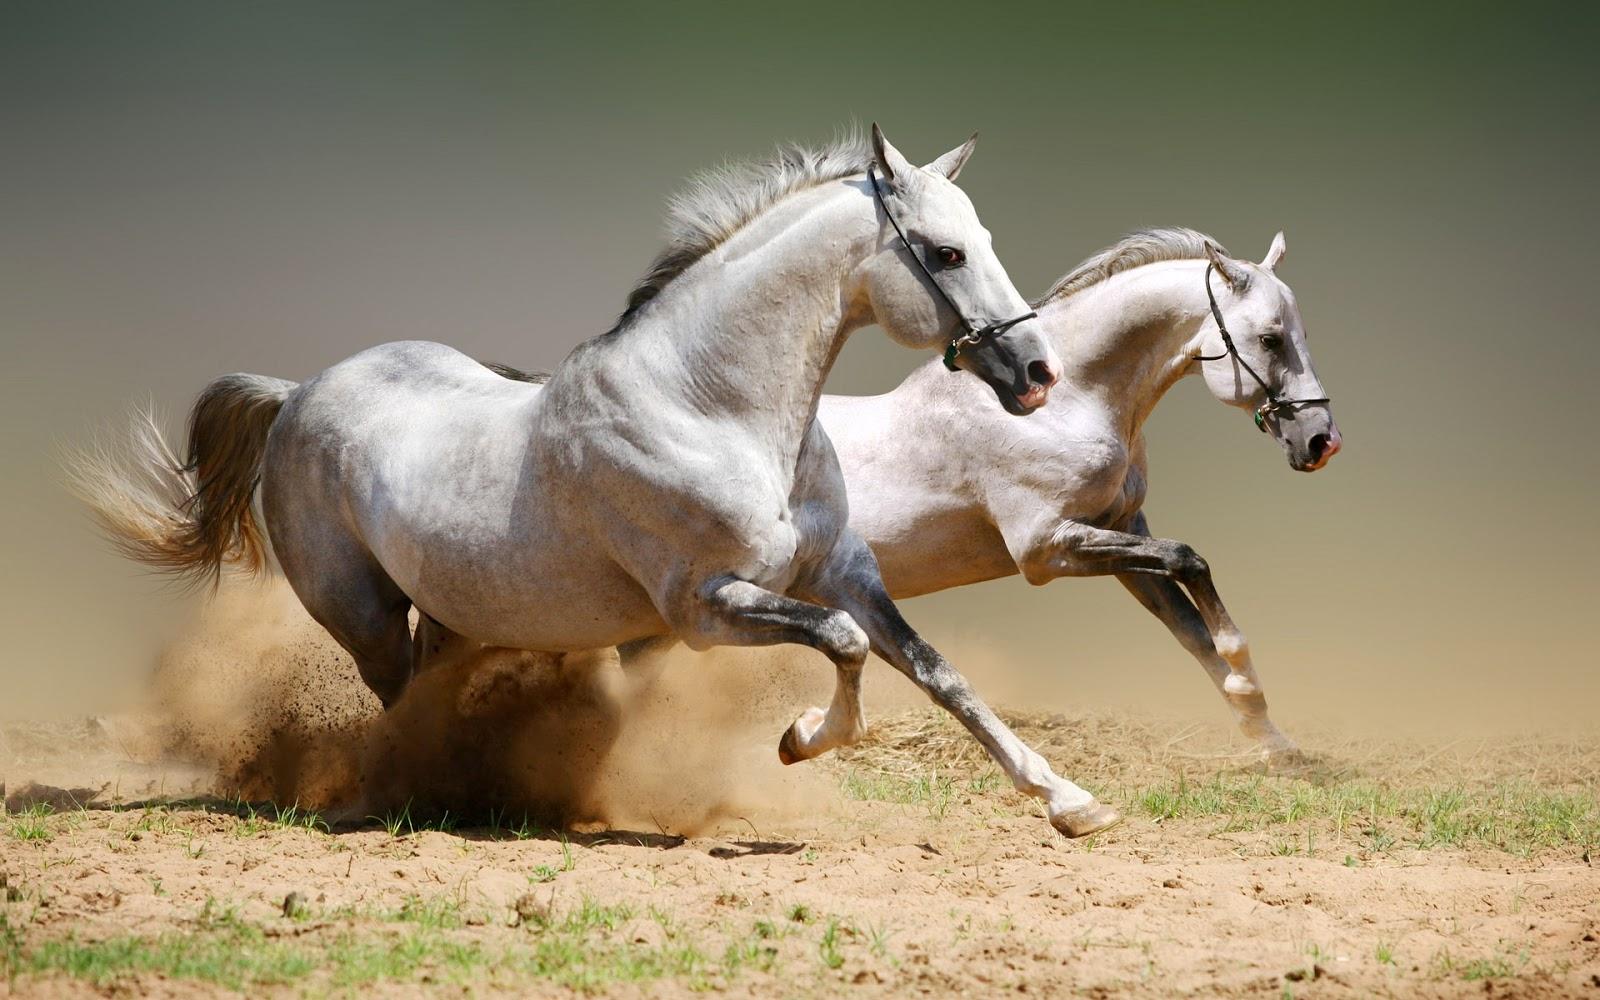 23 Beautiful HD Horse Wallpapers - HDWallSource.com